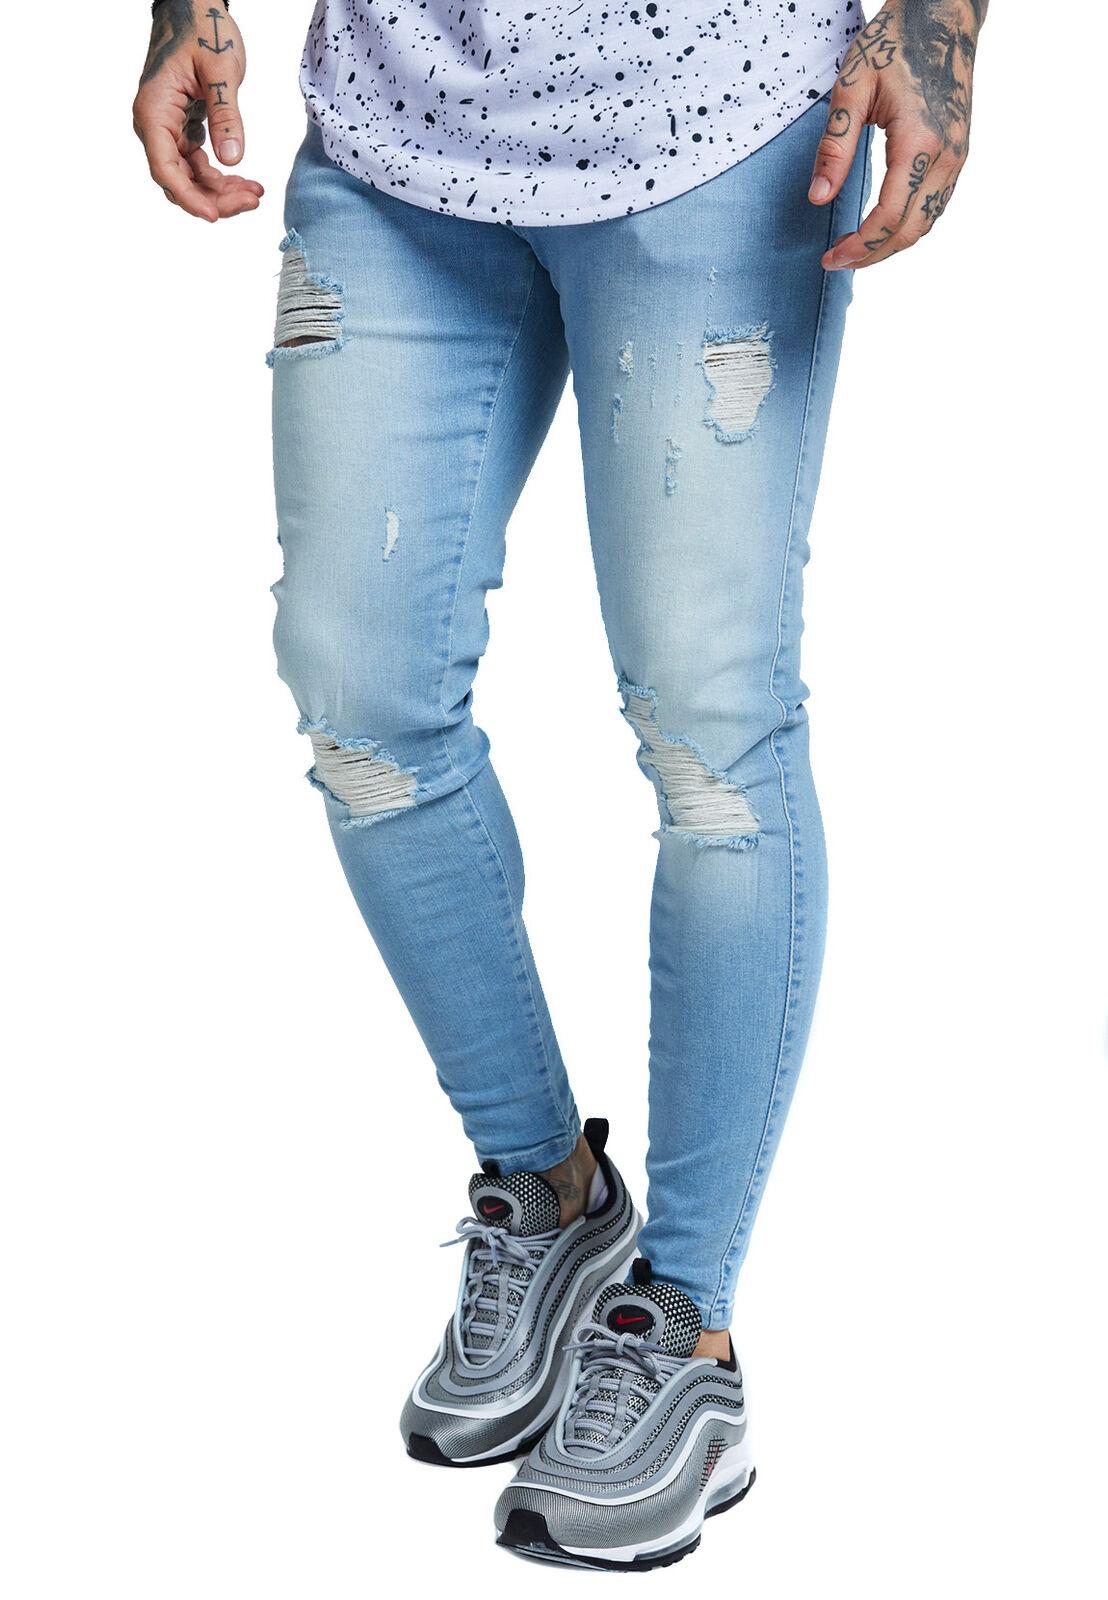 Siksilk Men's Jeans Skinny Distressed Denim Ss-12994 Light bluee Light bluee